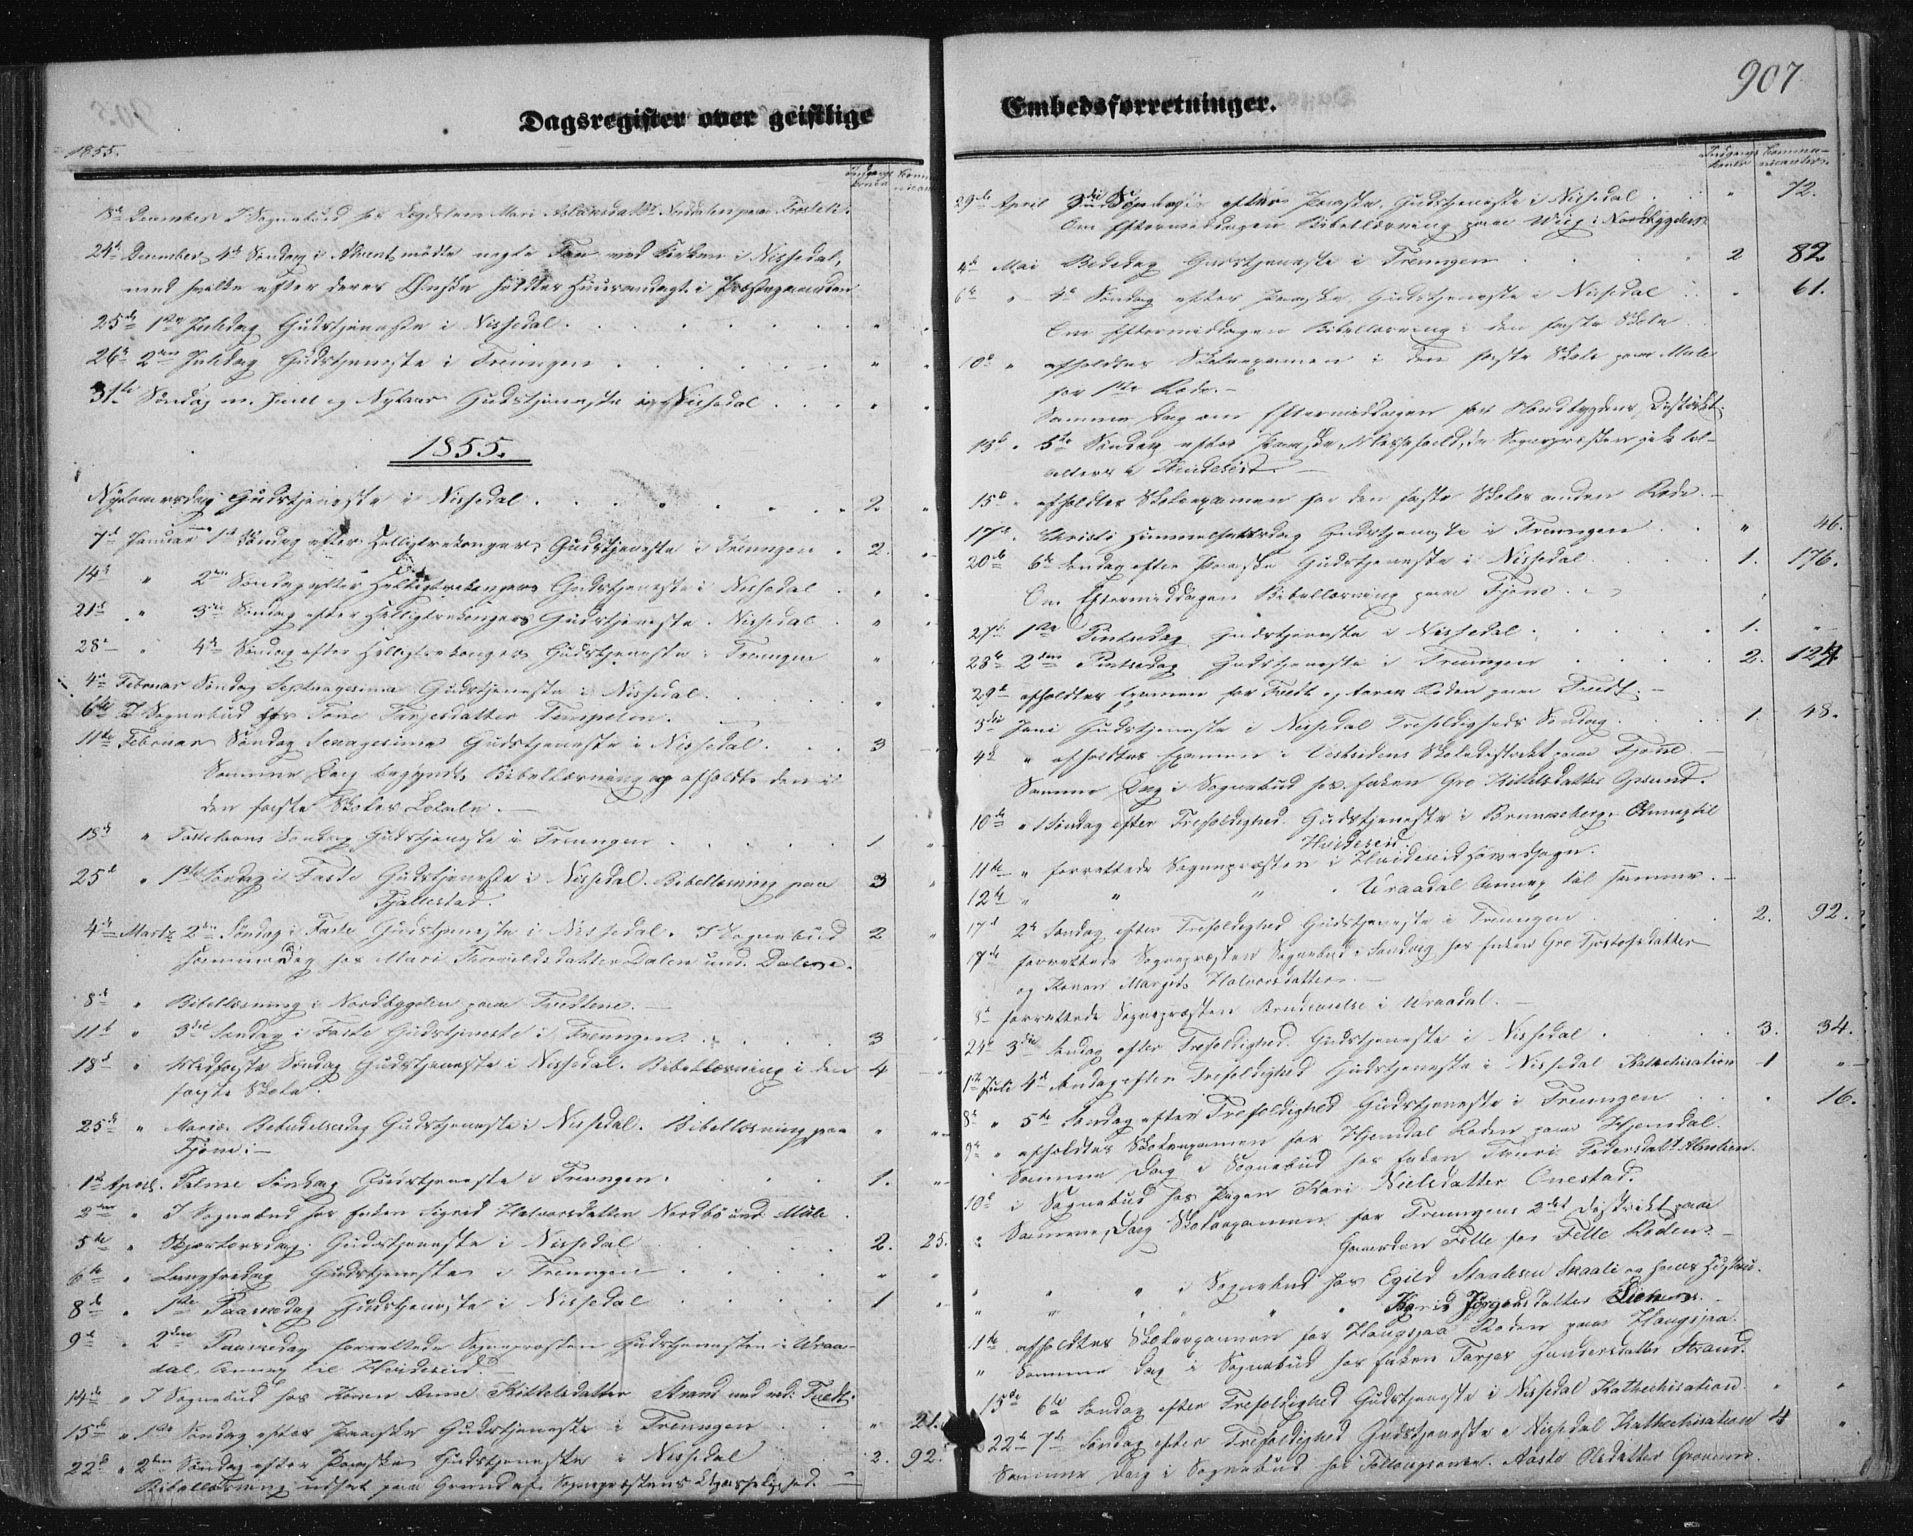 SAKO, Nissedal kirkebøker, F/Fa/L0003: Ministerialbok nr. I 3, 1846-1870, s. 906-907